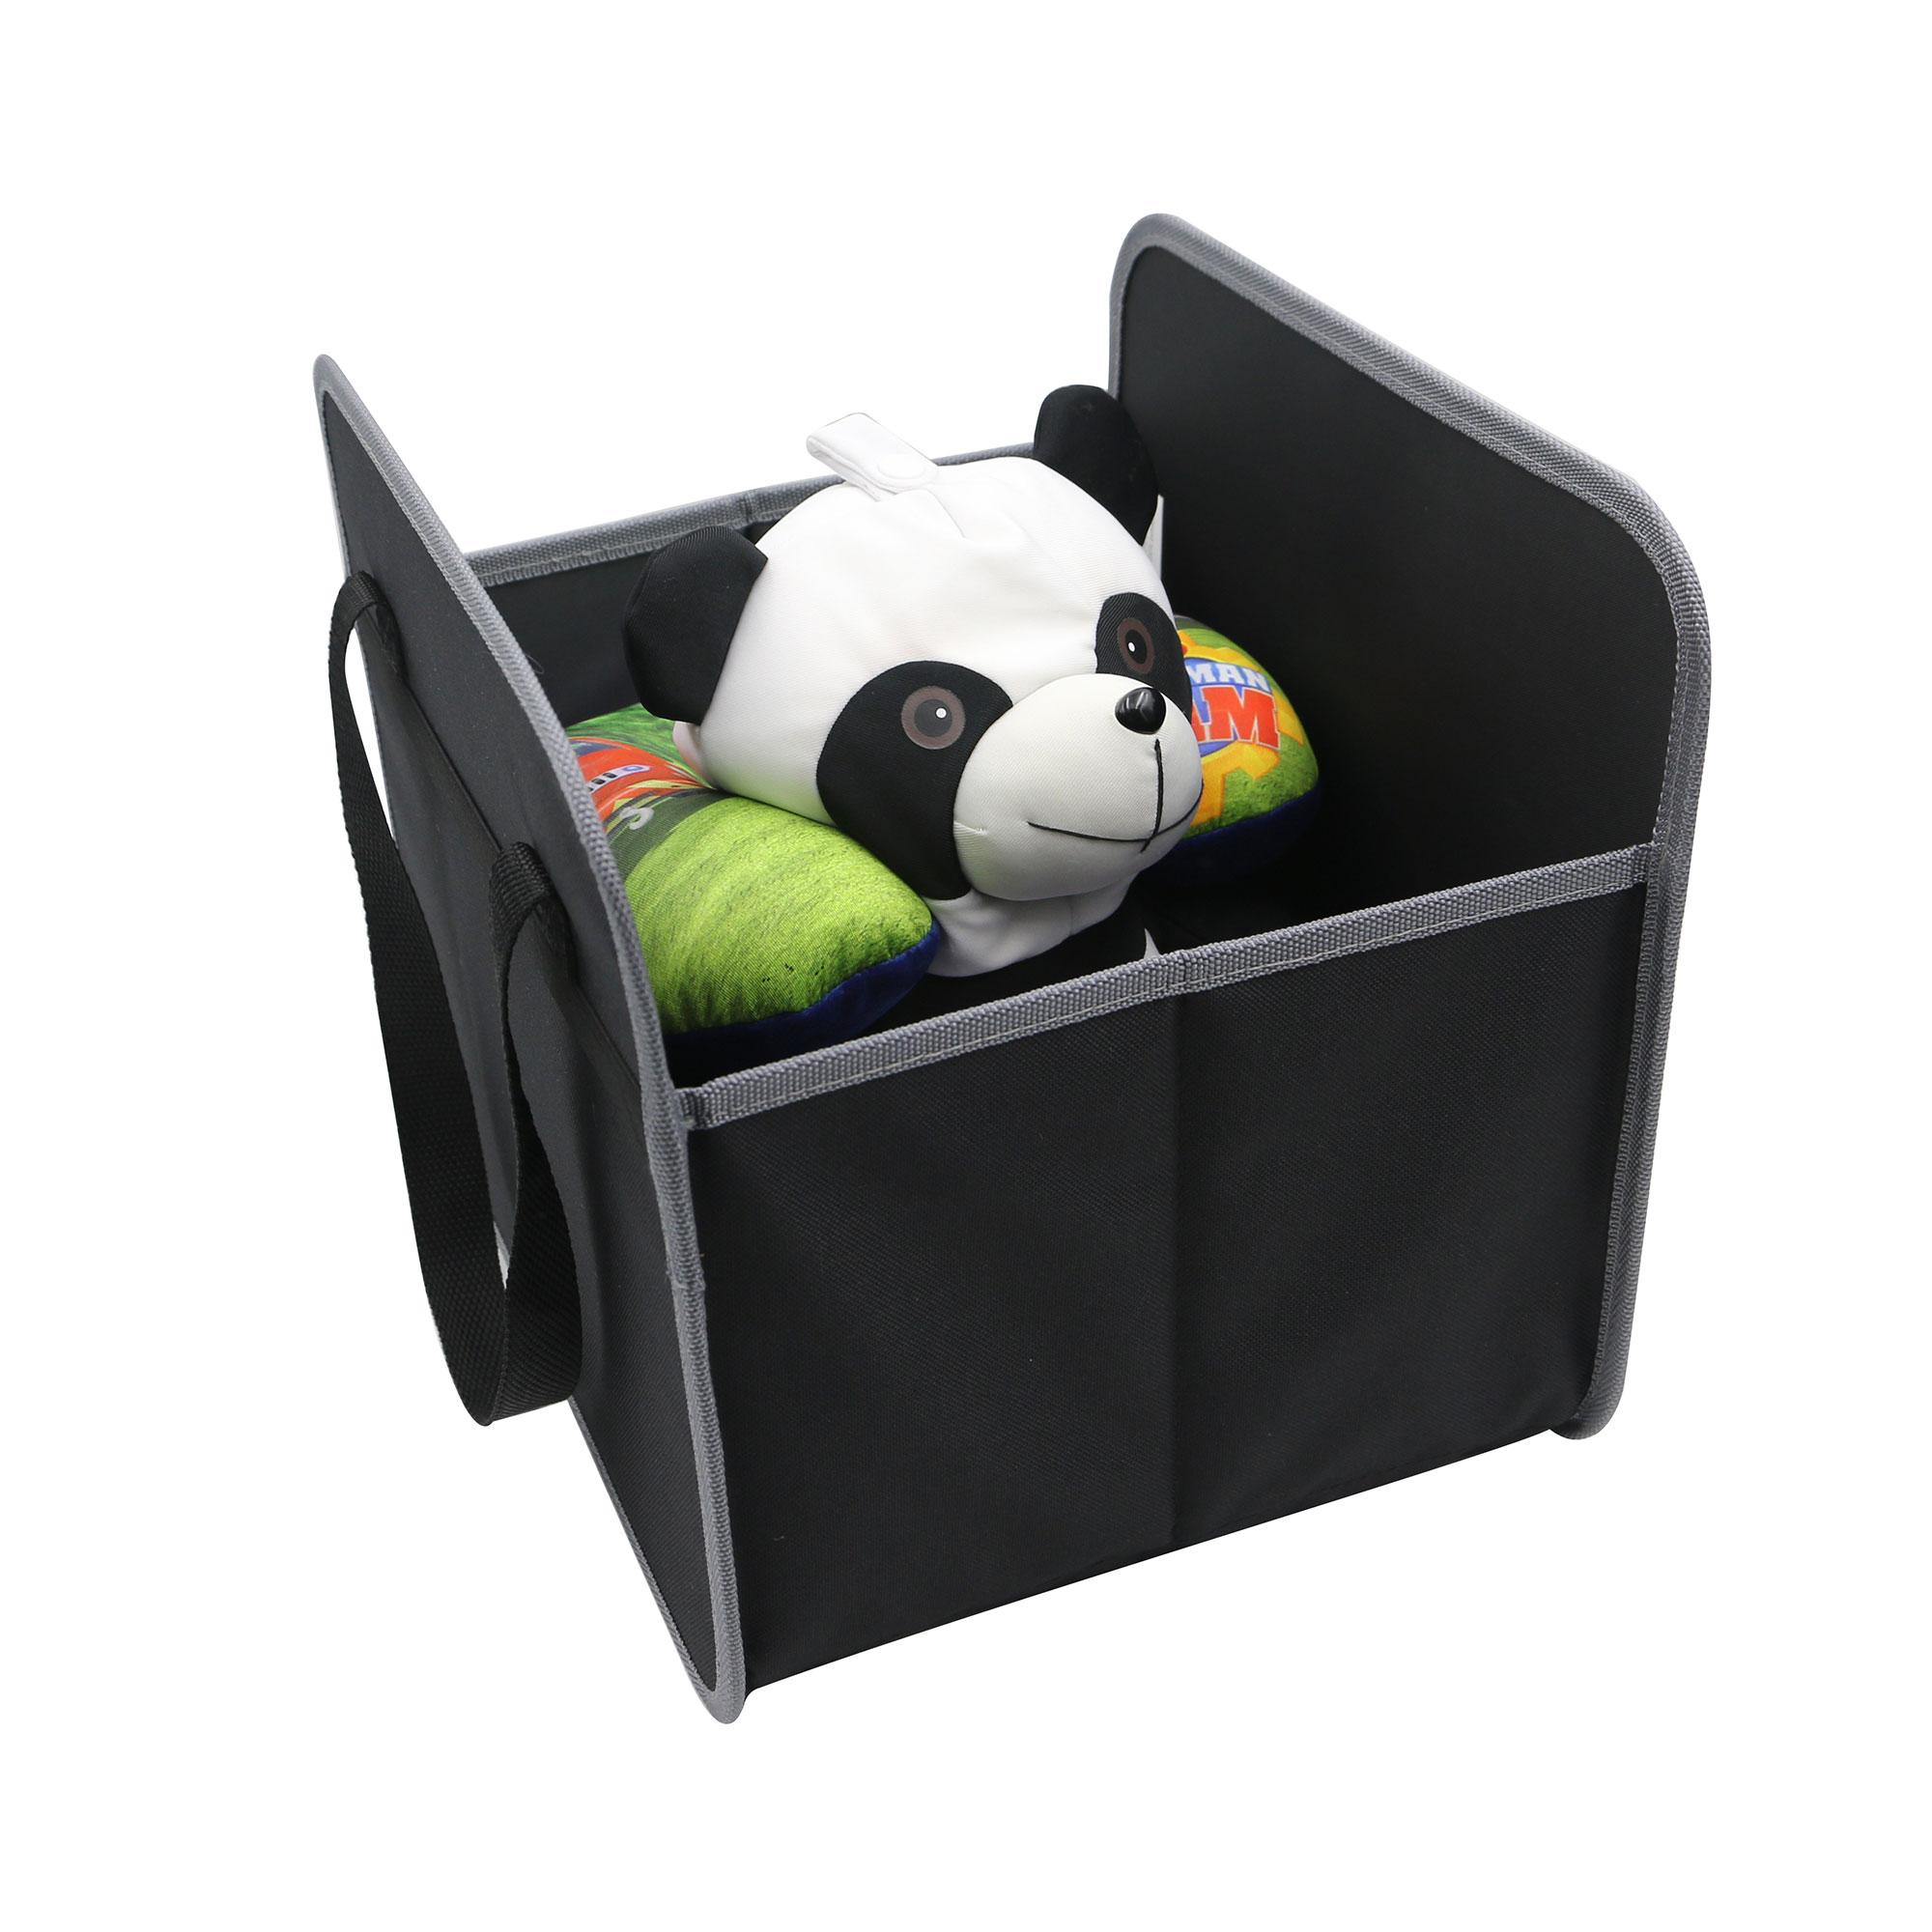 fh1137 gray trunk organizer